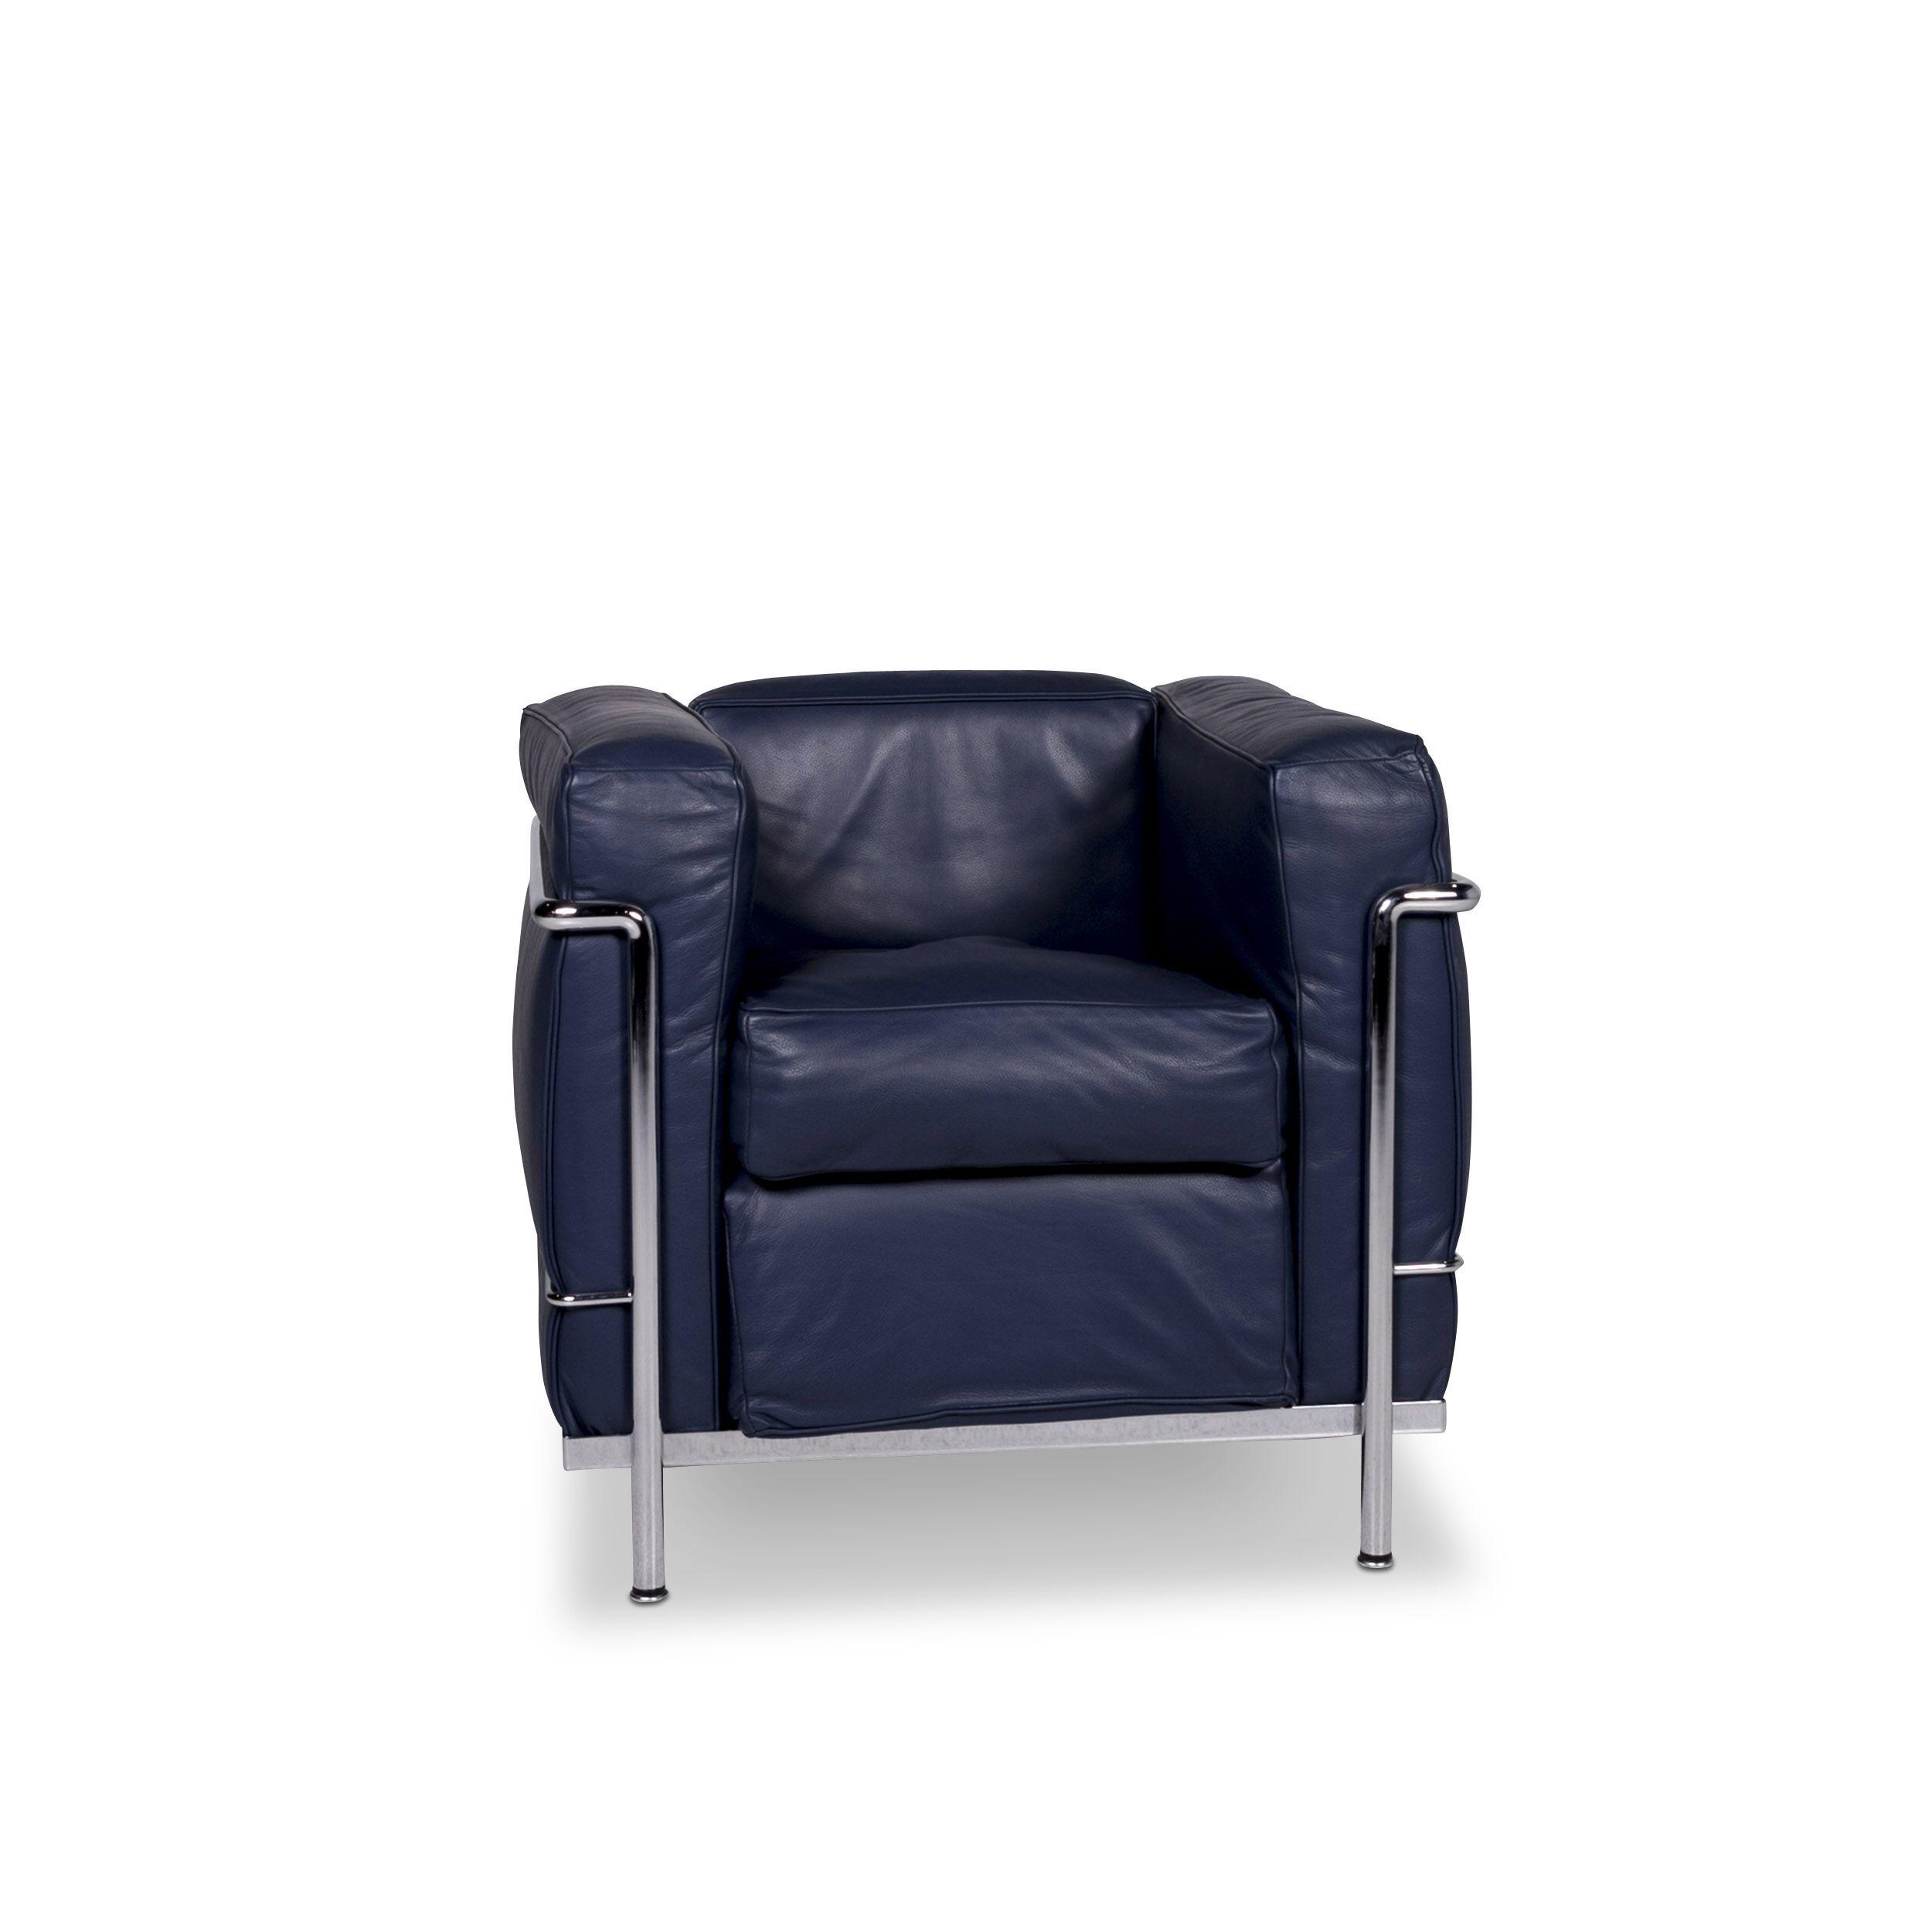 Cassina Le Corbusier Lc 2 Designer Leather Armchair Blue #9882